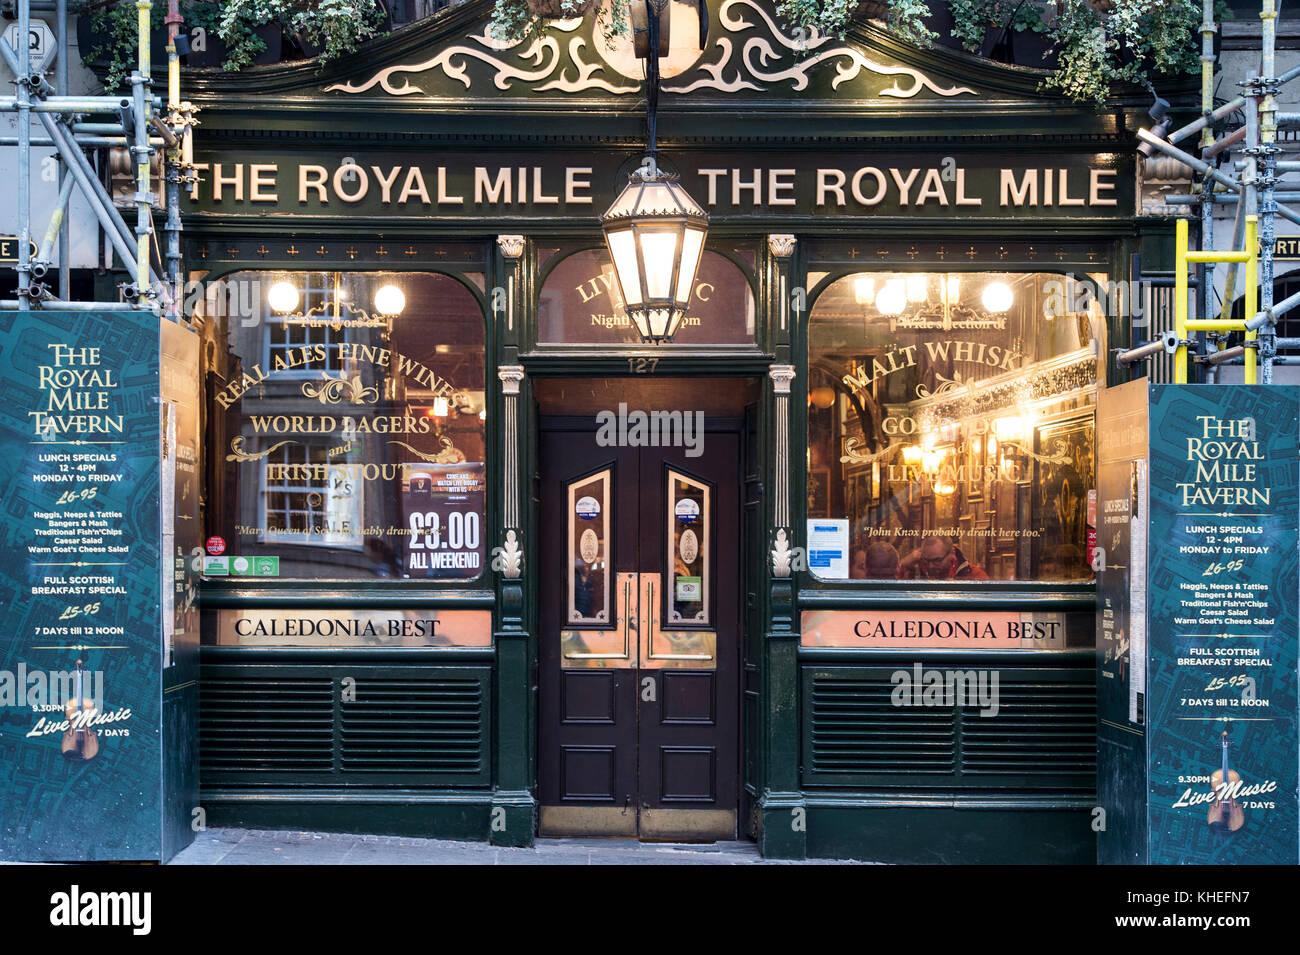 Royal Merchandise Stock Photos Amp Royal Merchandise Stock